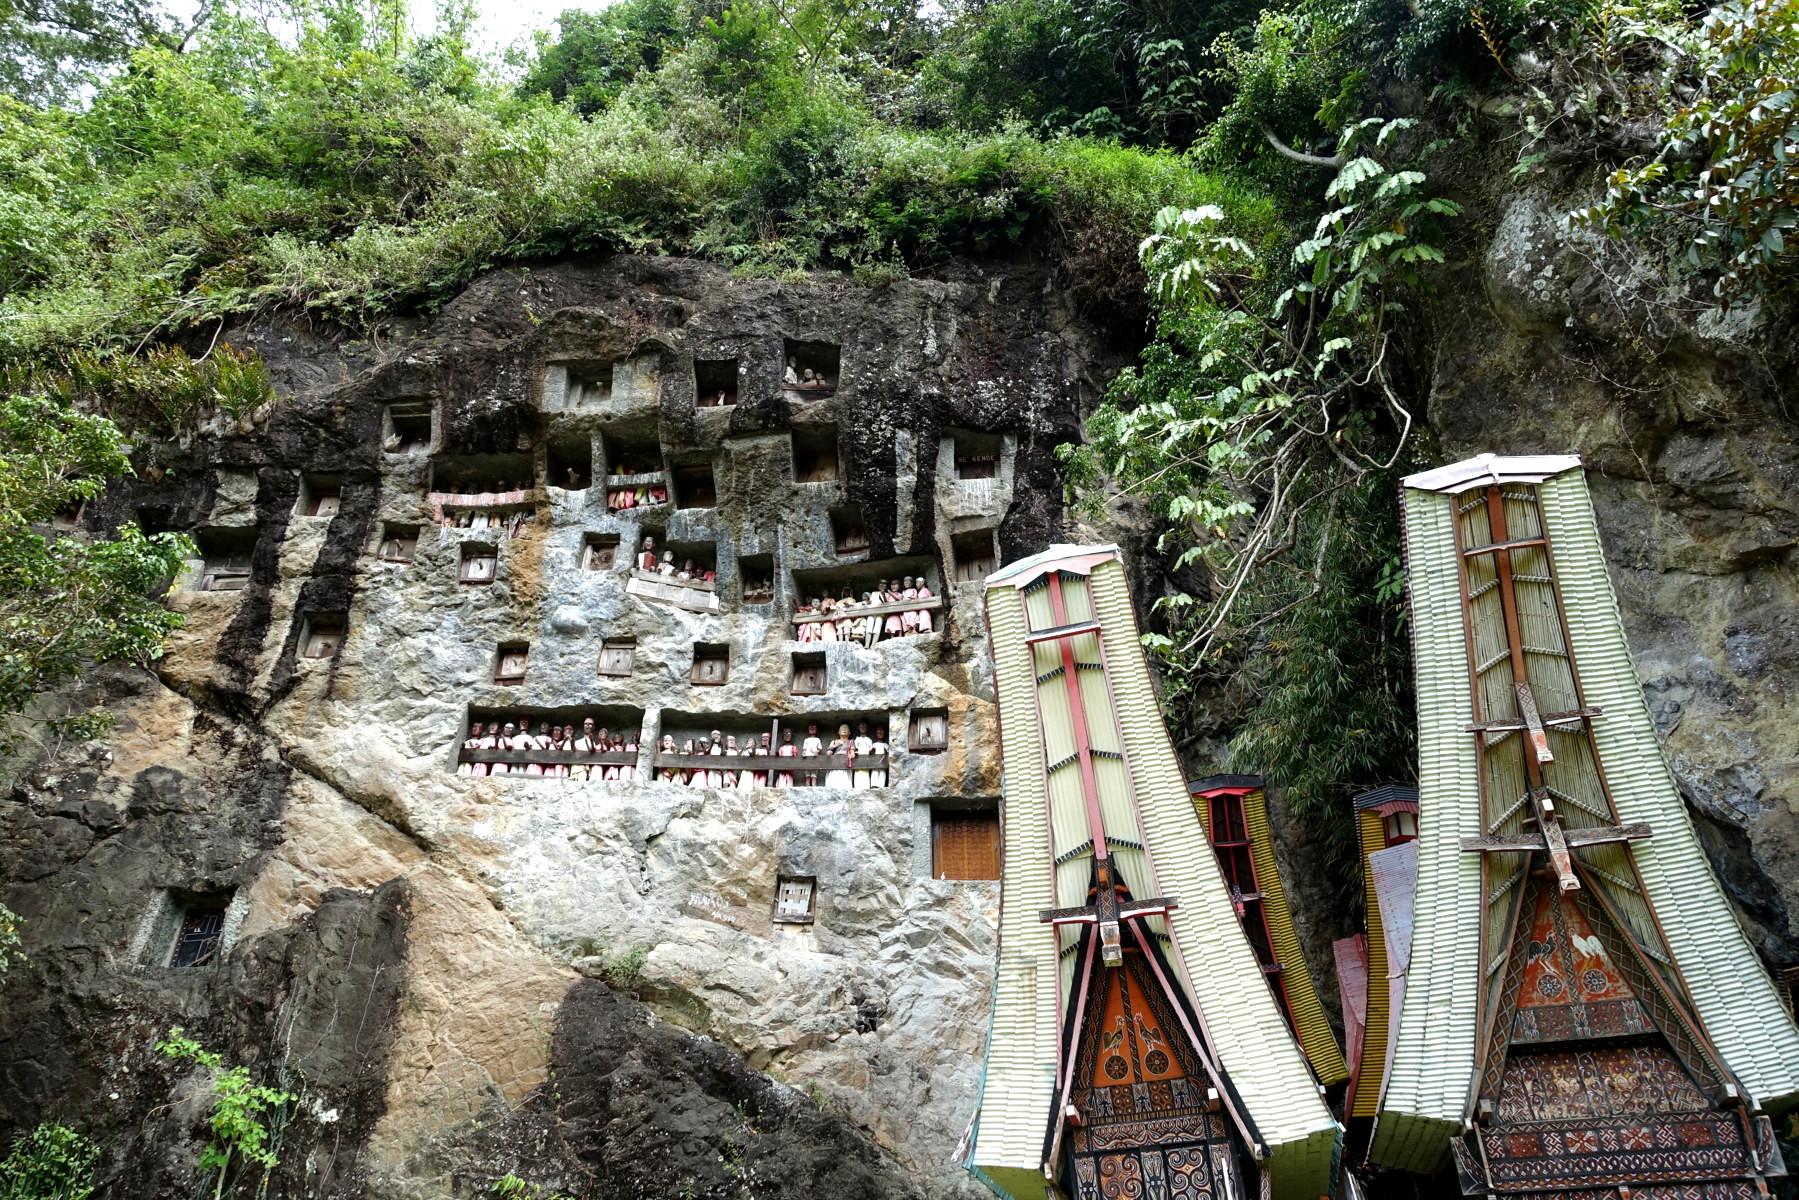 Indonesie_Sulawesi_Toraja_Rantepao DSC05072